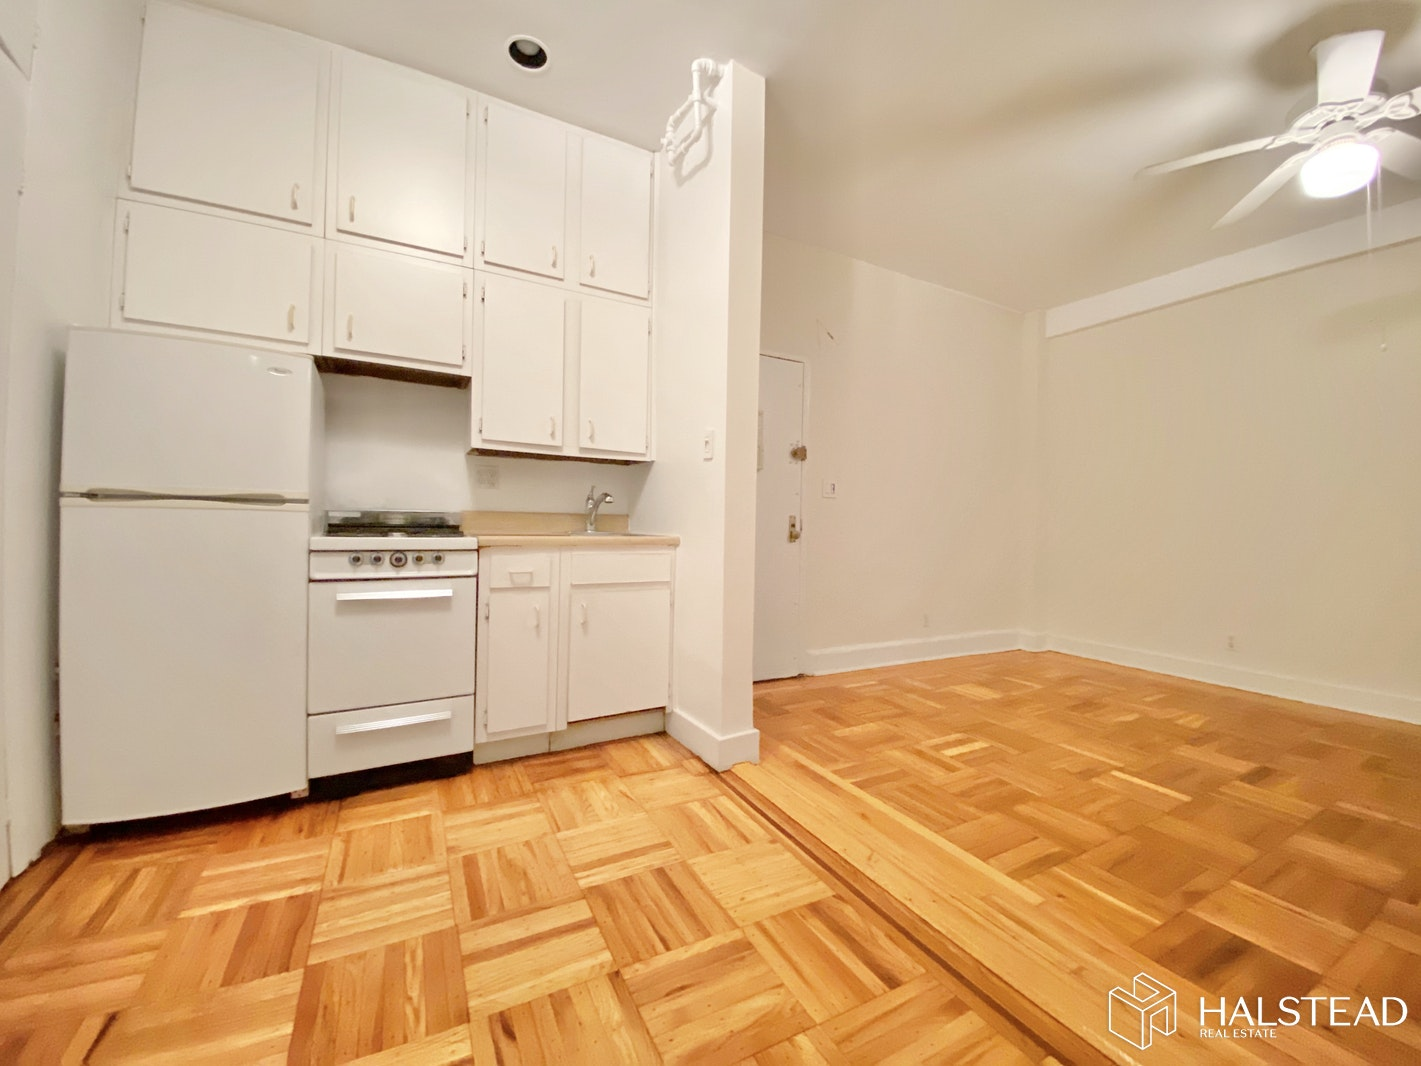 245 WEST 75TH STREET 3H, Upper West Side, $2,100, Web #: 20127728